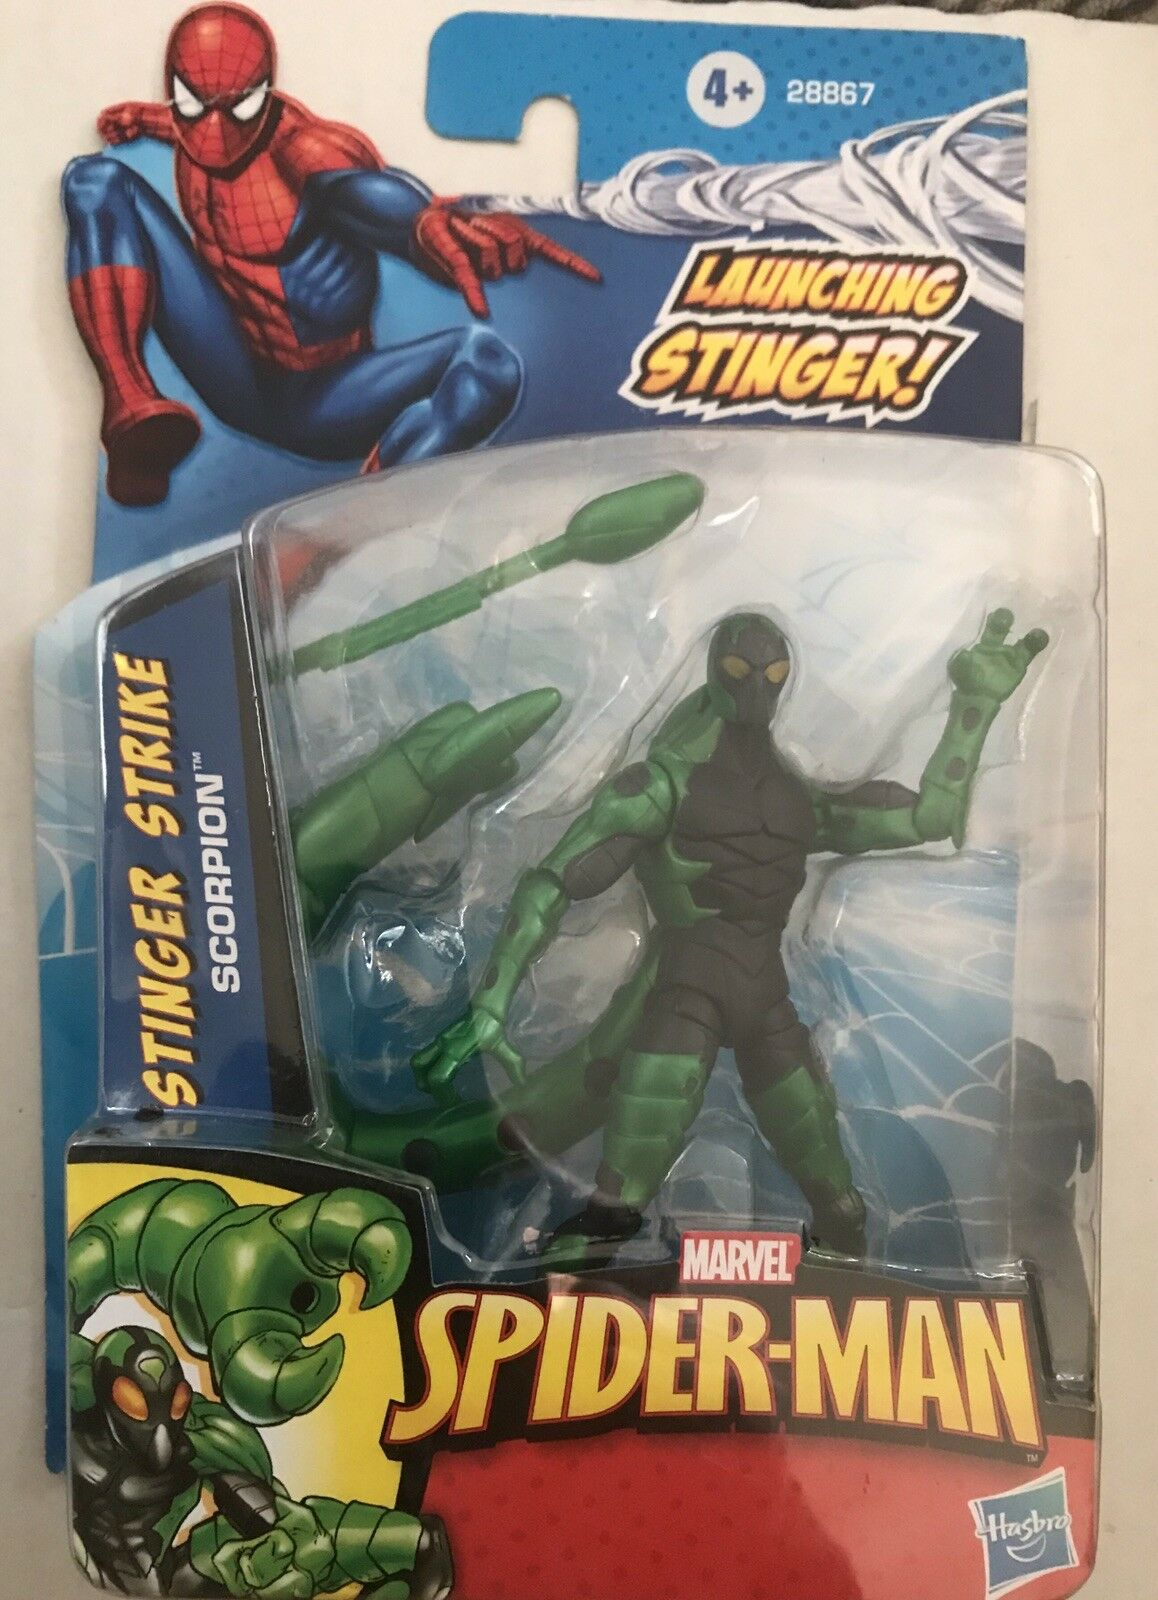 Spider-Man Action Figure of STINGER STRIKE SCORPION From  Spider-Man Series